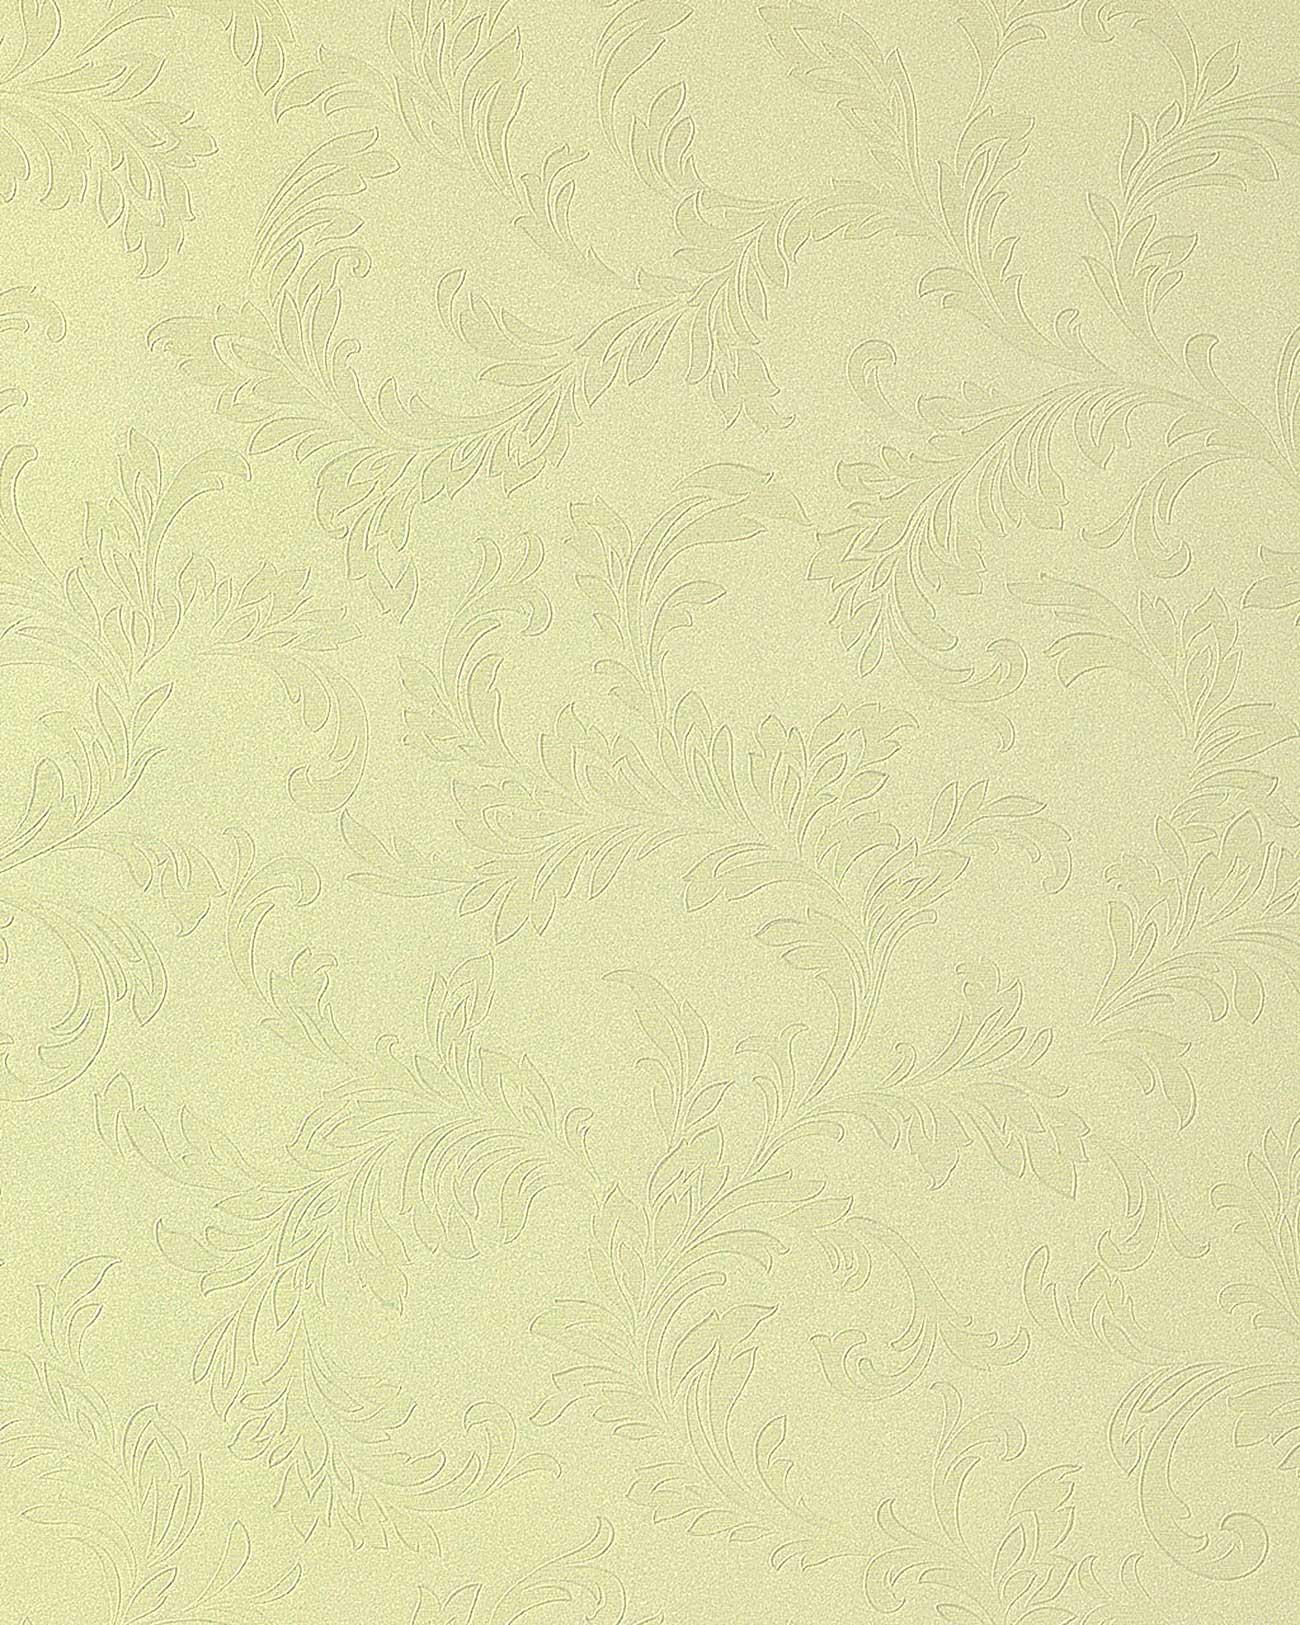 flowers tone on tone pastel yellow ivory 533 sqm 57 sq ft 1300x1625